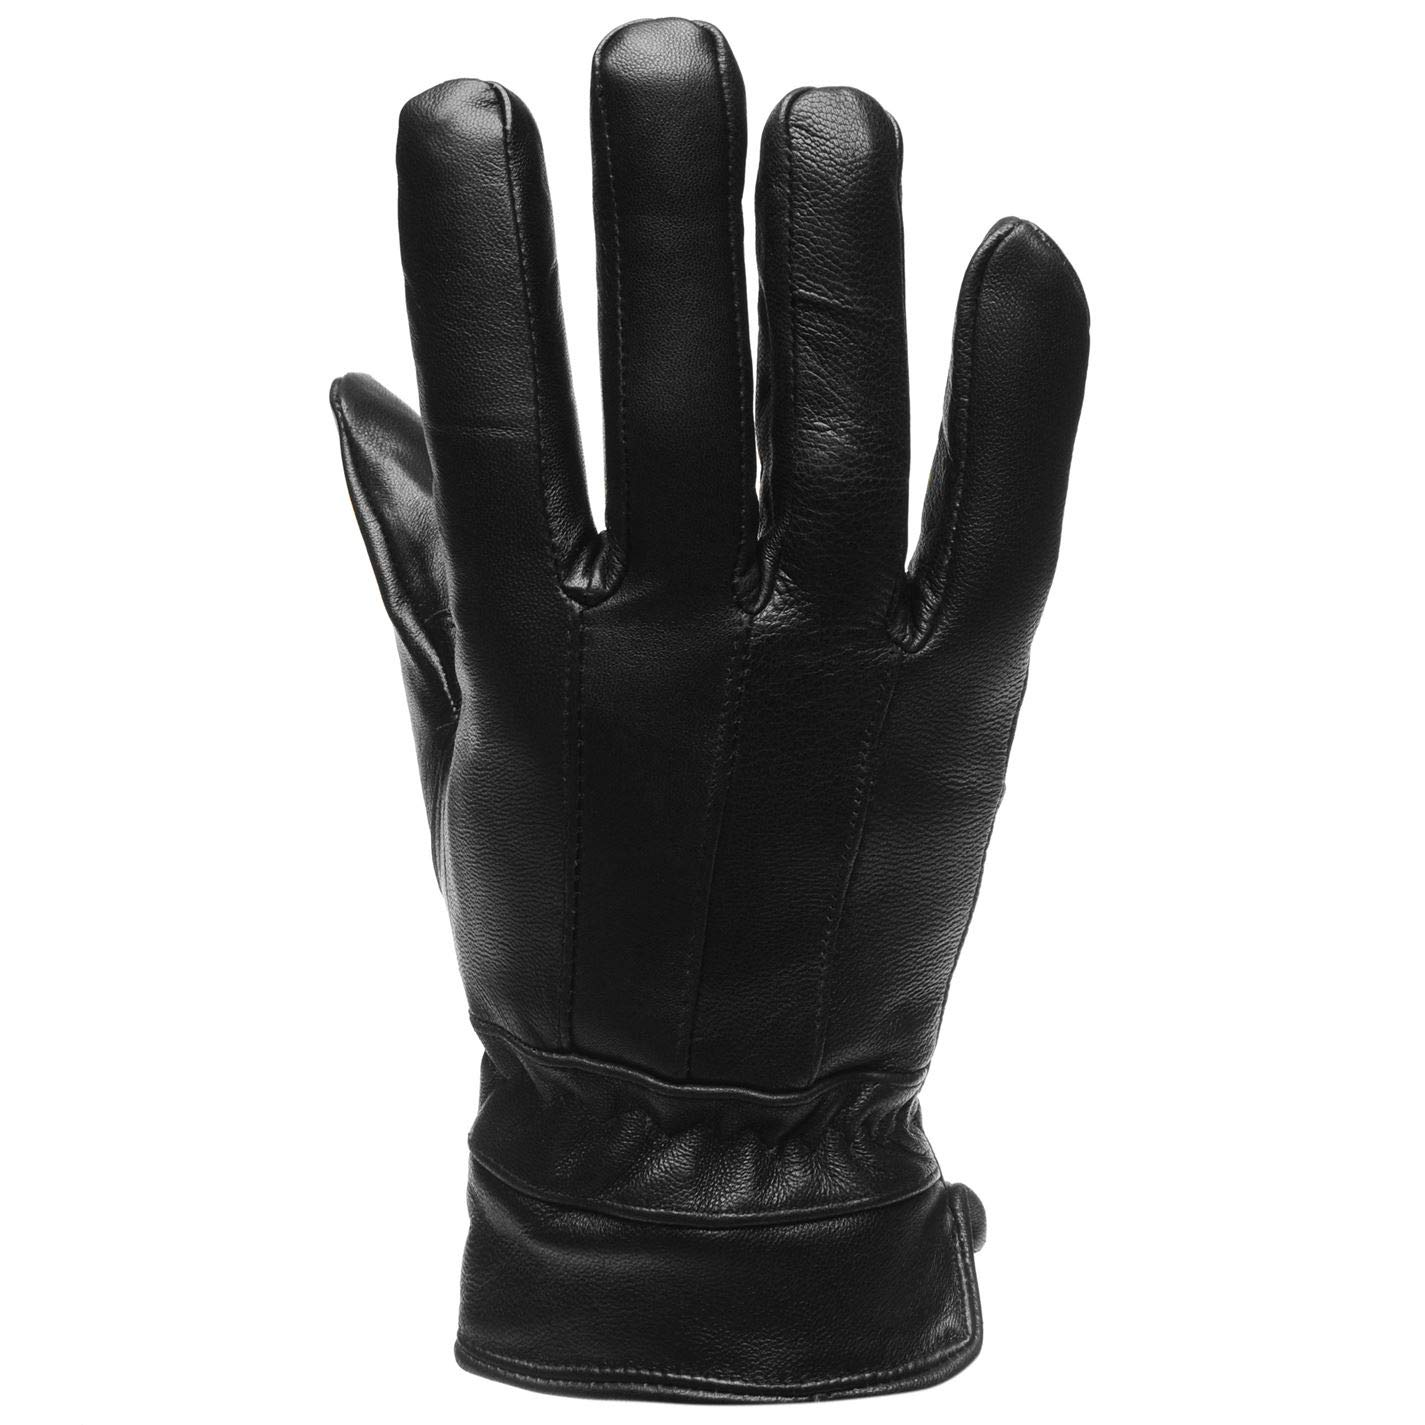 Firetrap Mens Leather Gloves Winter Warm Black S-M